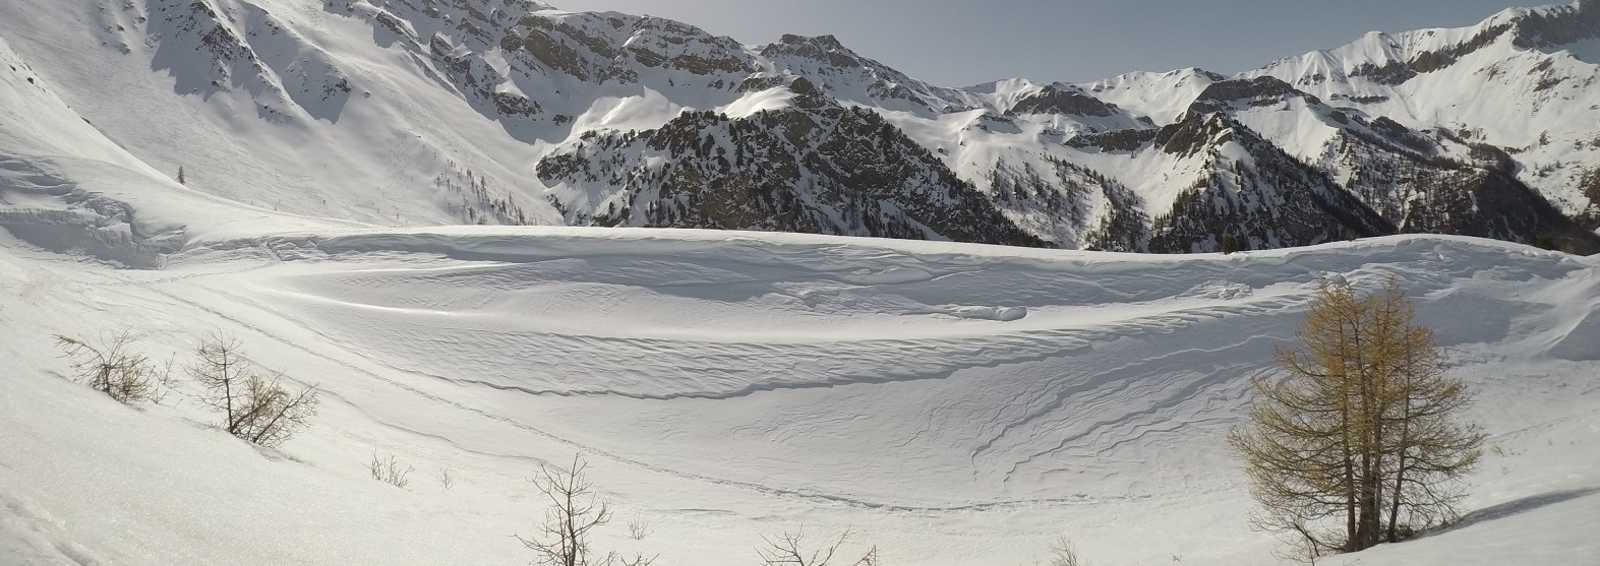 Queyras Regional Natural Park, Southern Alps